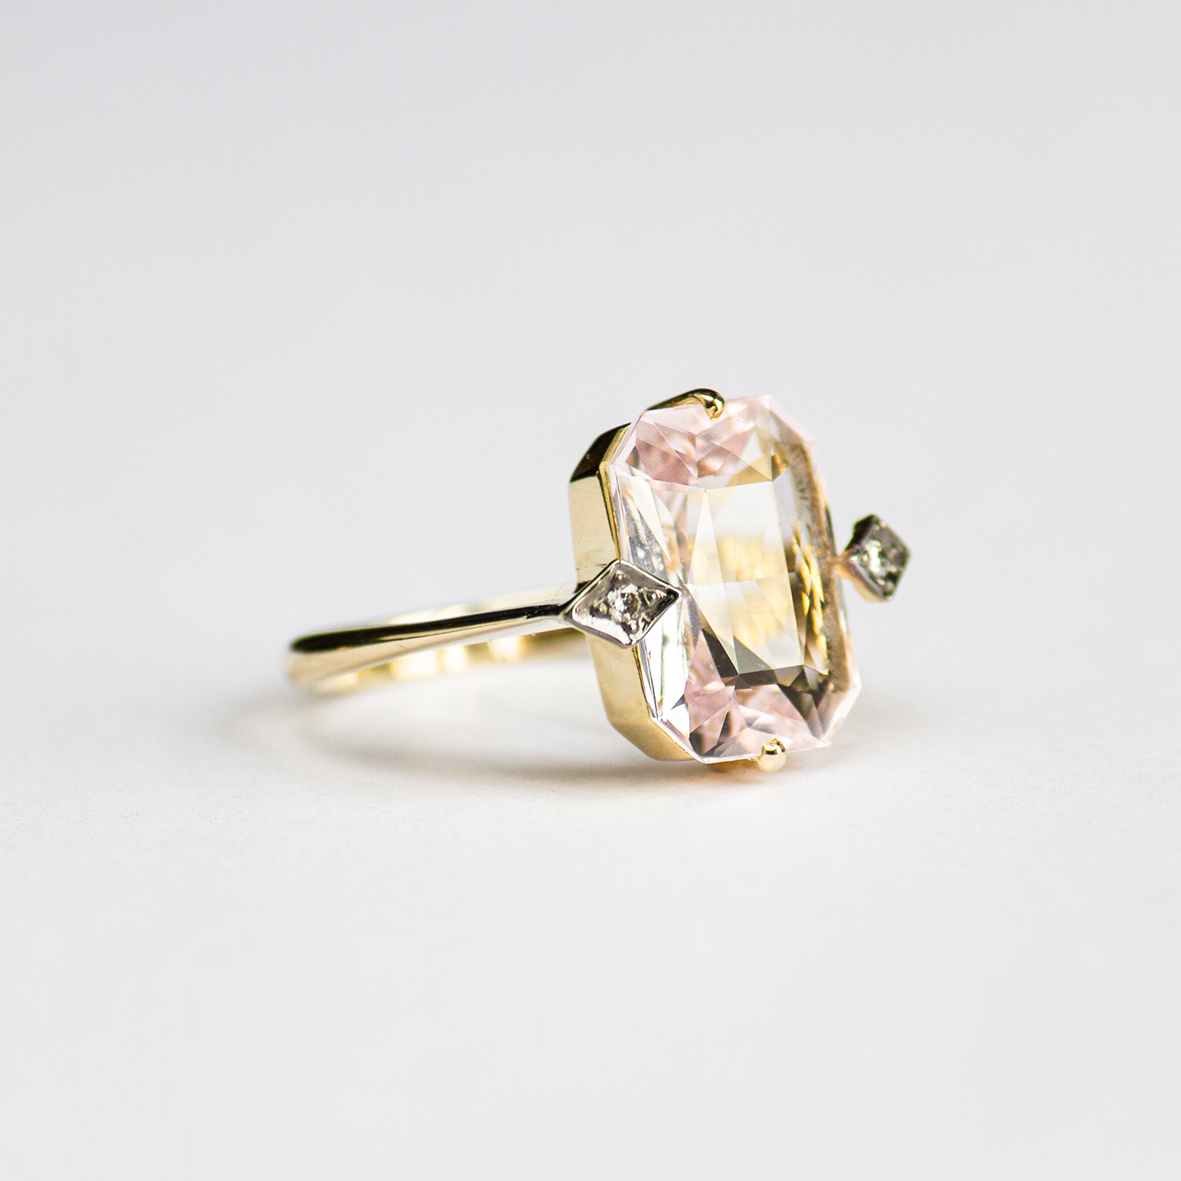 2. OONA_gems of ceylon_ficha2_morganite ring